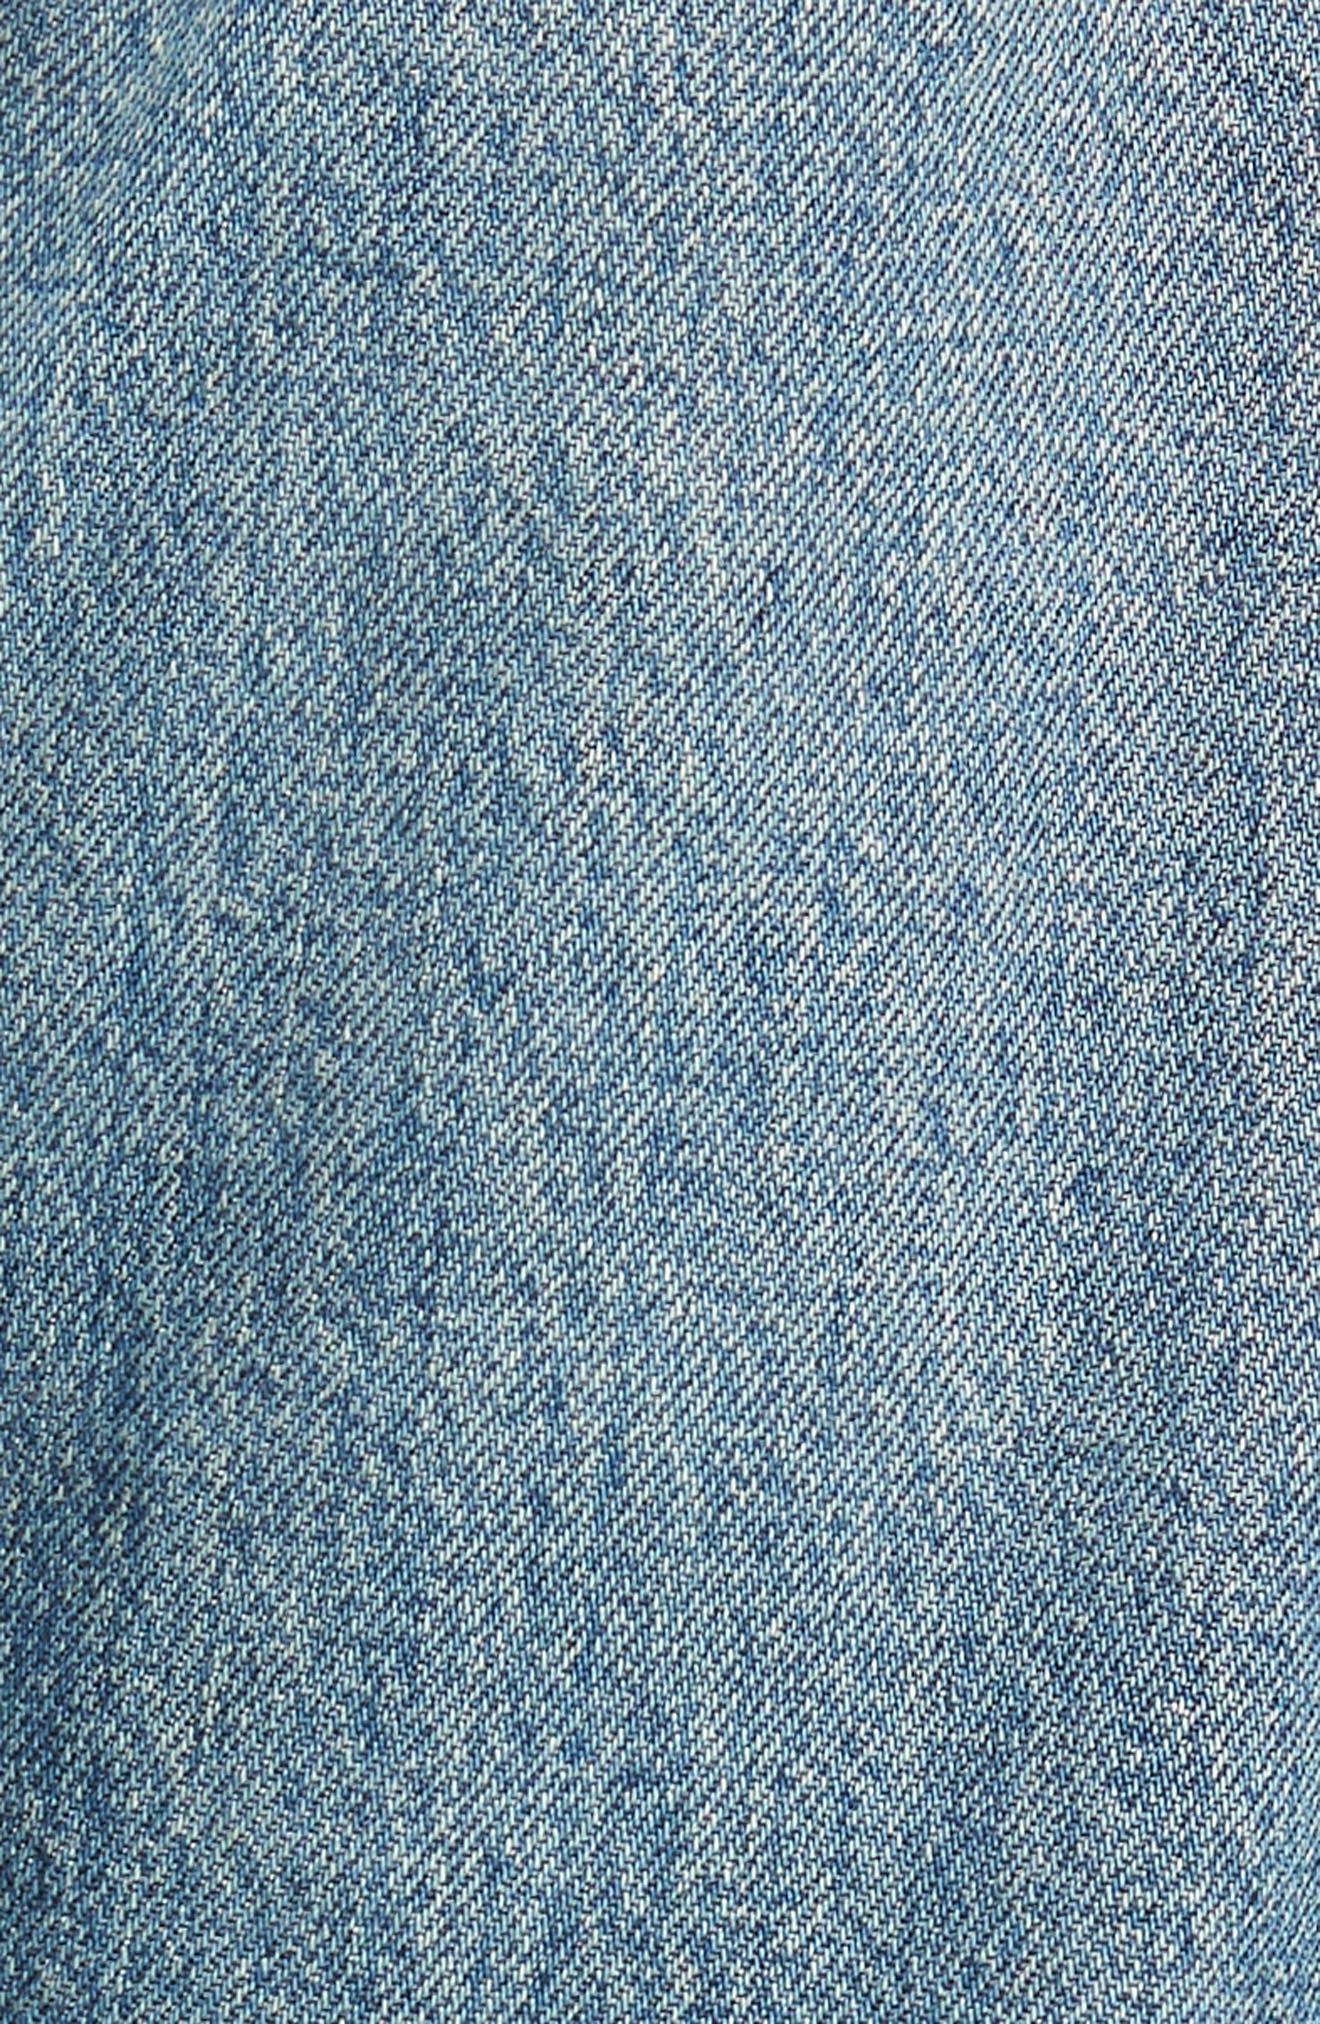 Emerson Crop Slim Boyfriend Jeans,                             Alternate thumbnail 6, color,                             Somerset